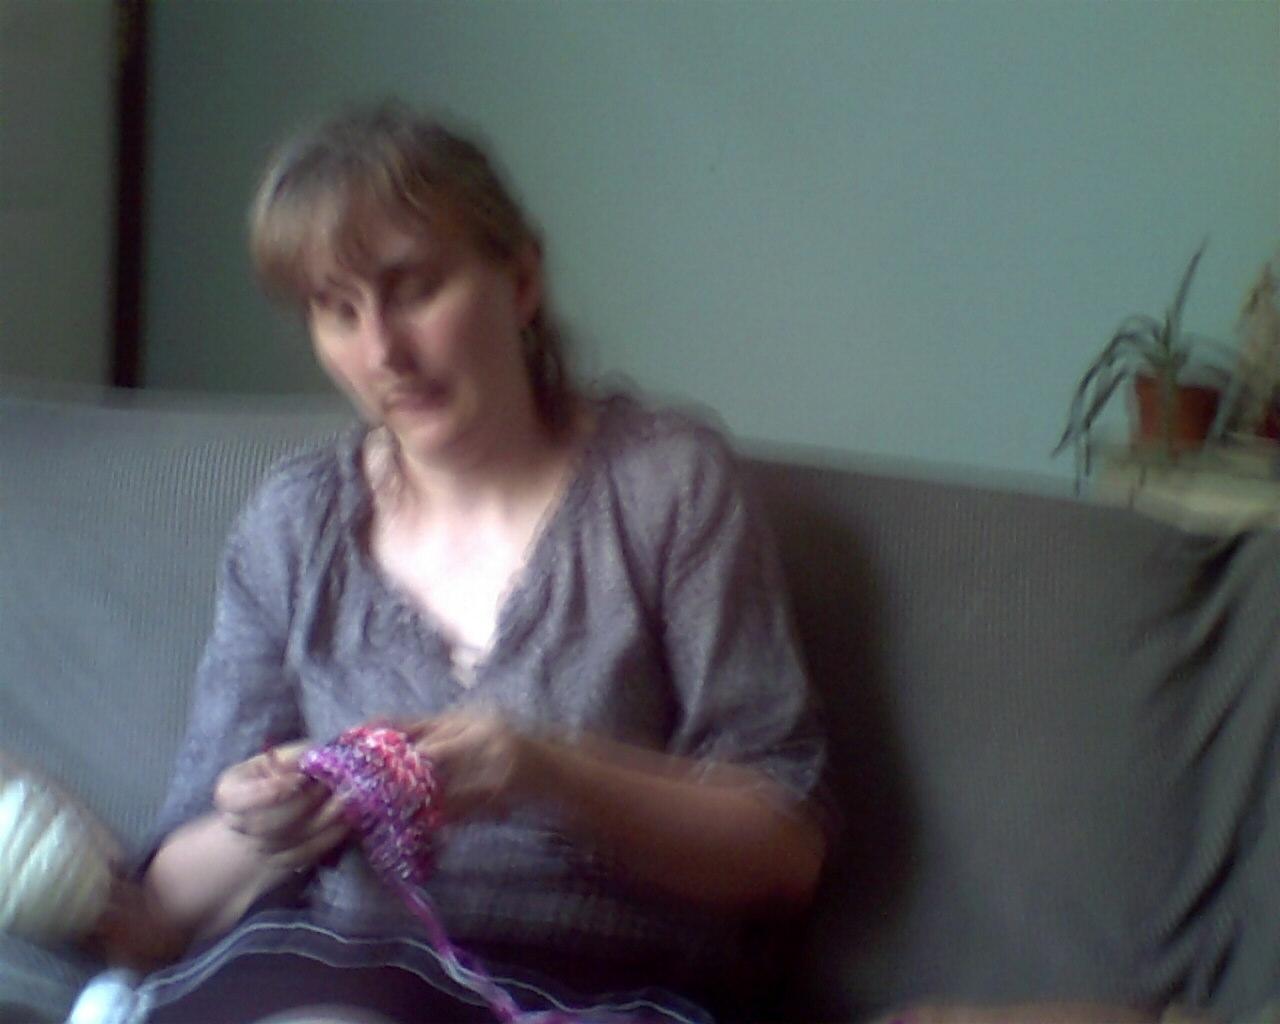 Me crocheting